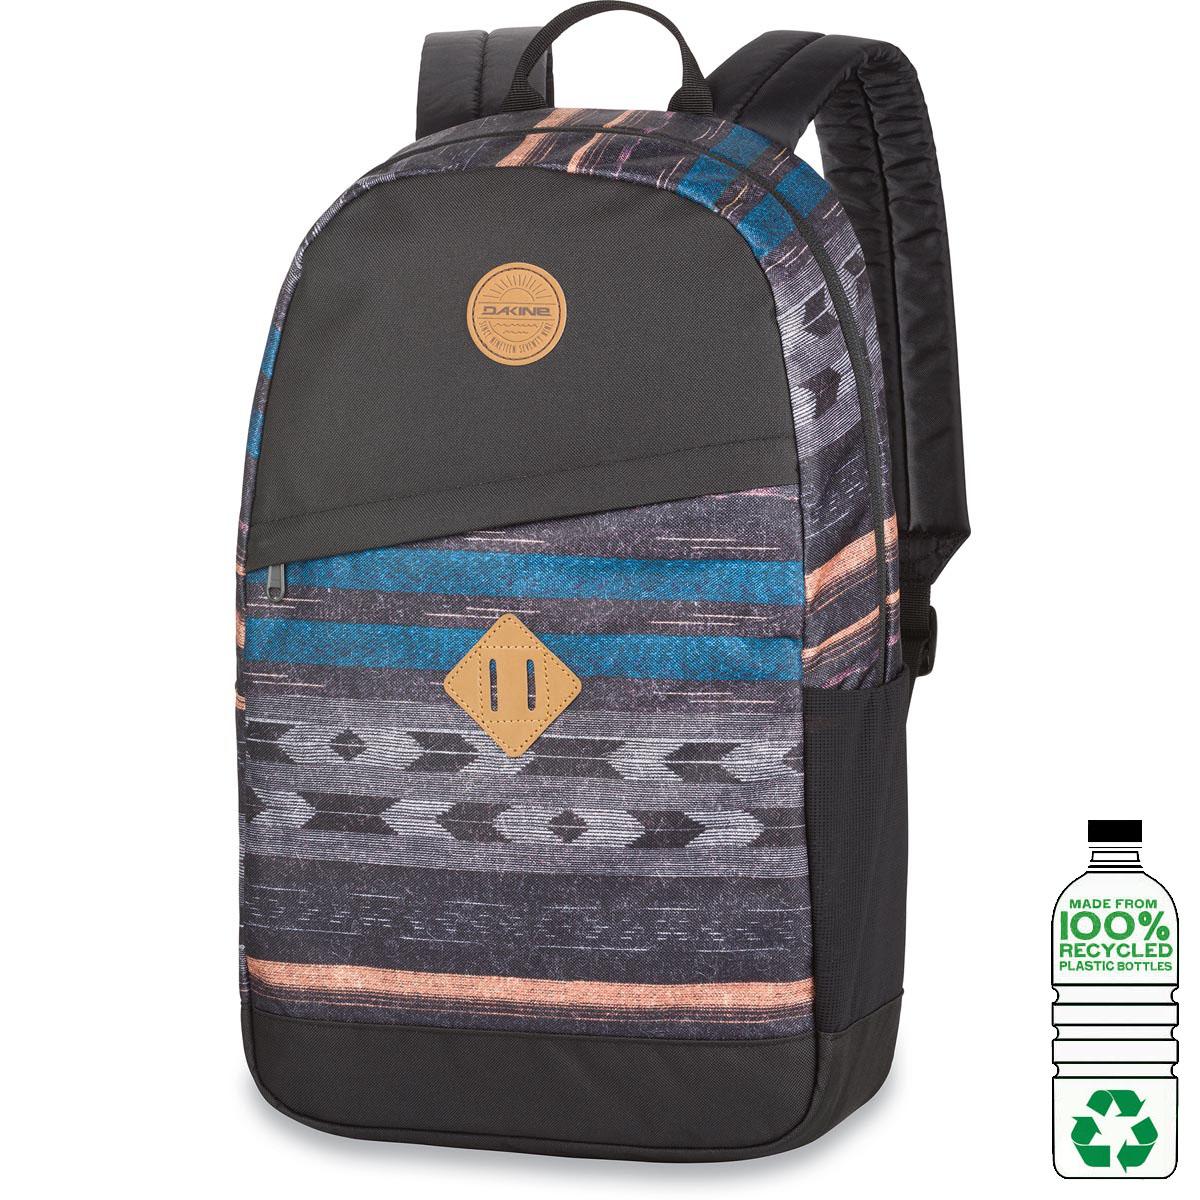 2aacf87d55fdb Dakine Switch 21L Backpack Inversion